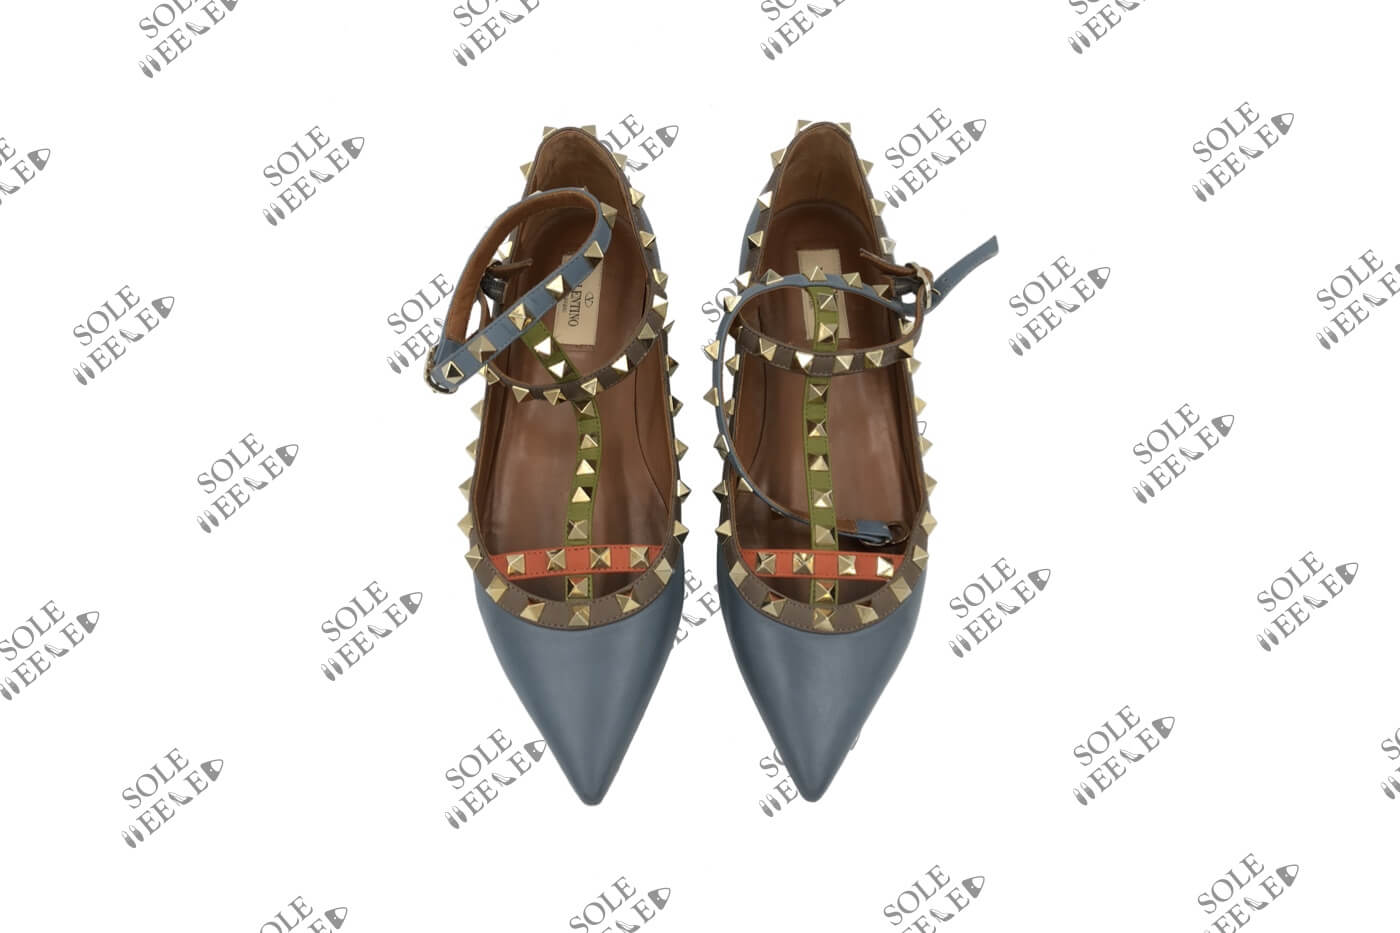 Valentino Garavani Shoe Restoration